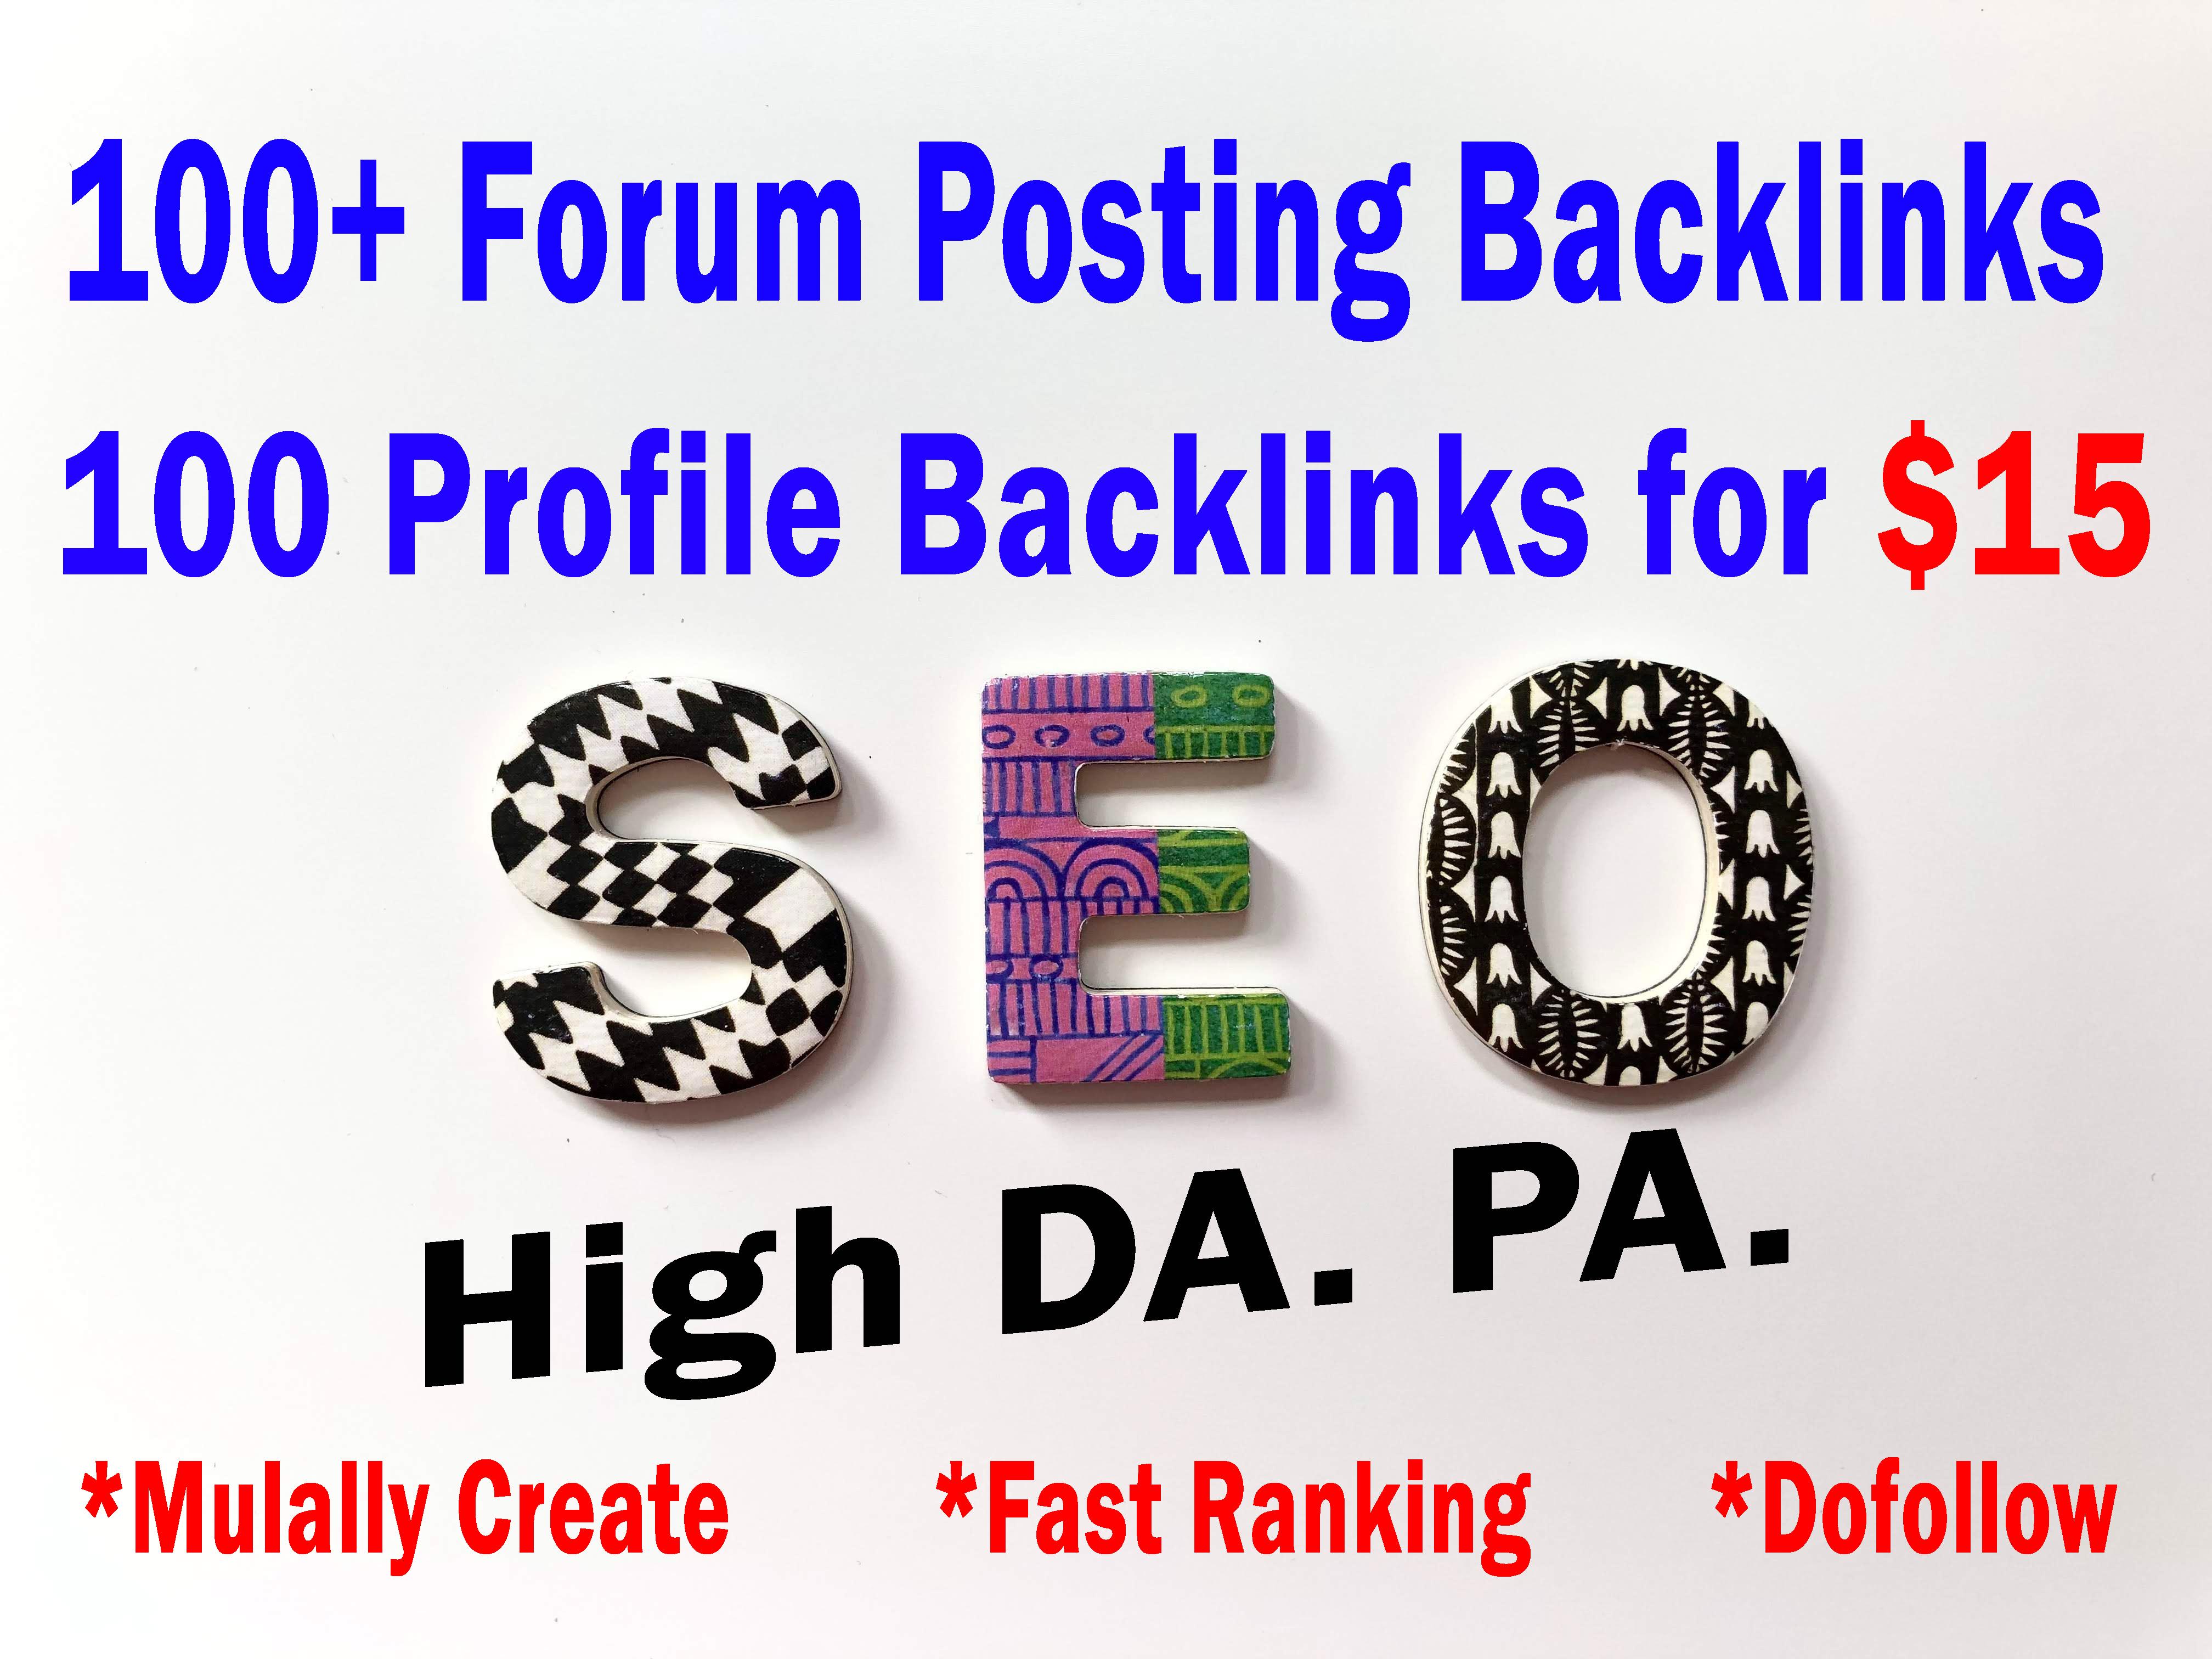 Build 100+ Profile Backlinks 100+ Forum Posting Backlinks High Authority DA60-90+ Manually